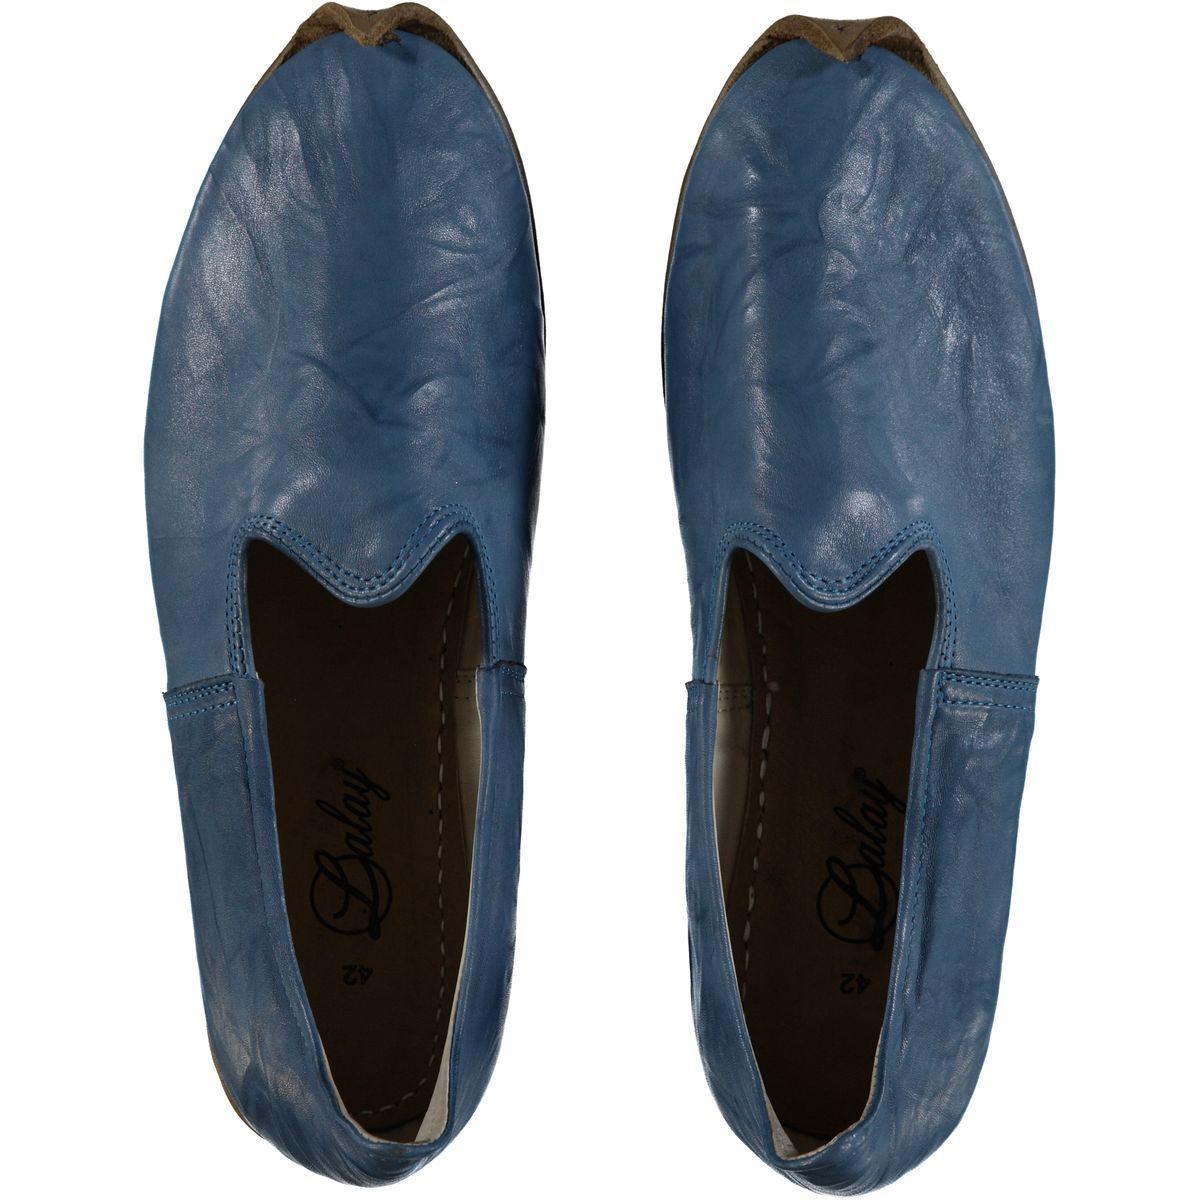 Shoe - Babouche / Leather / Handmade - Blue